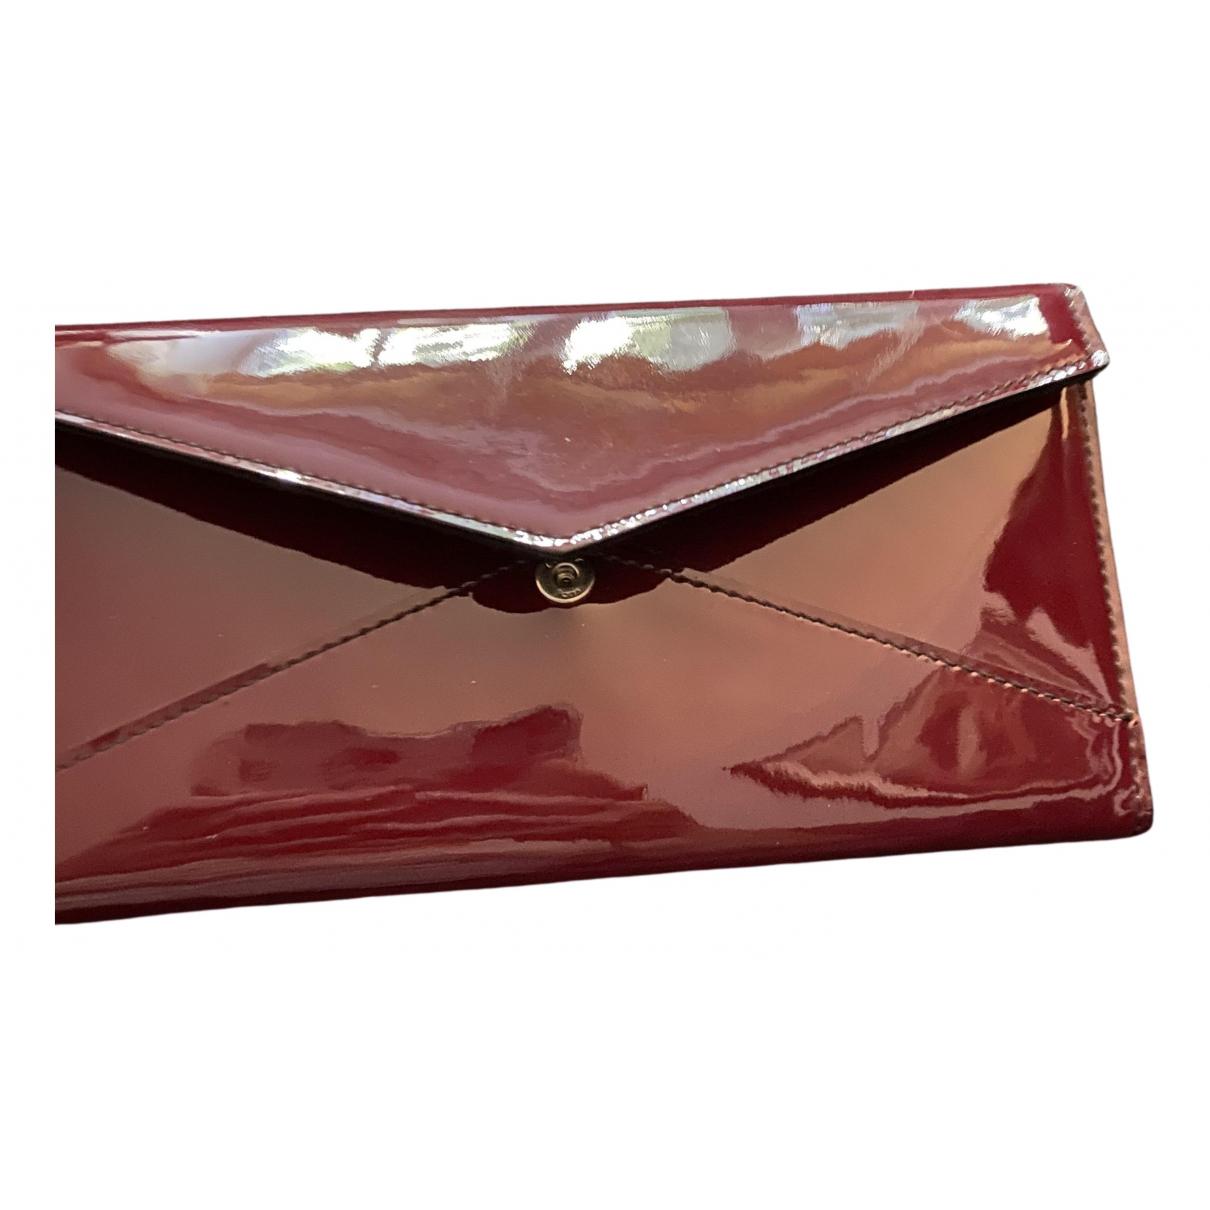 Cartier \N Portemonnaie in  Rot Lackleder